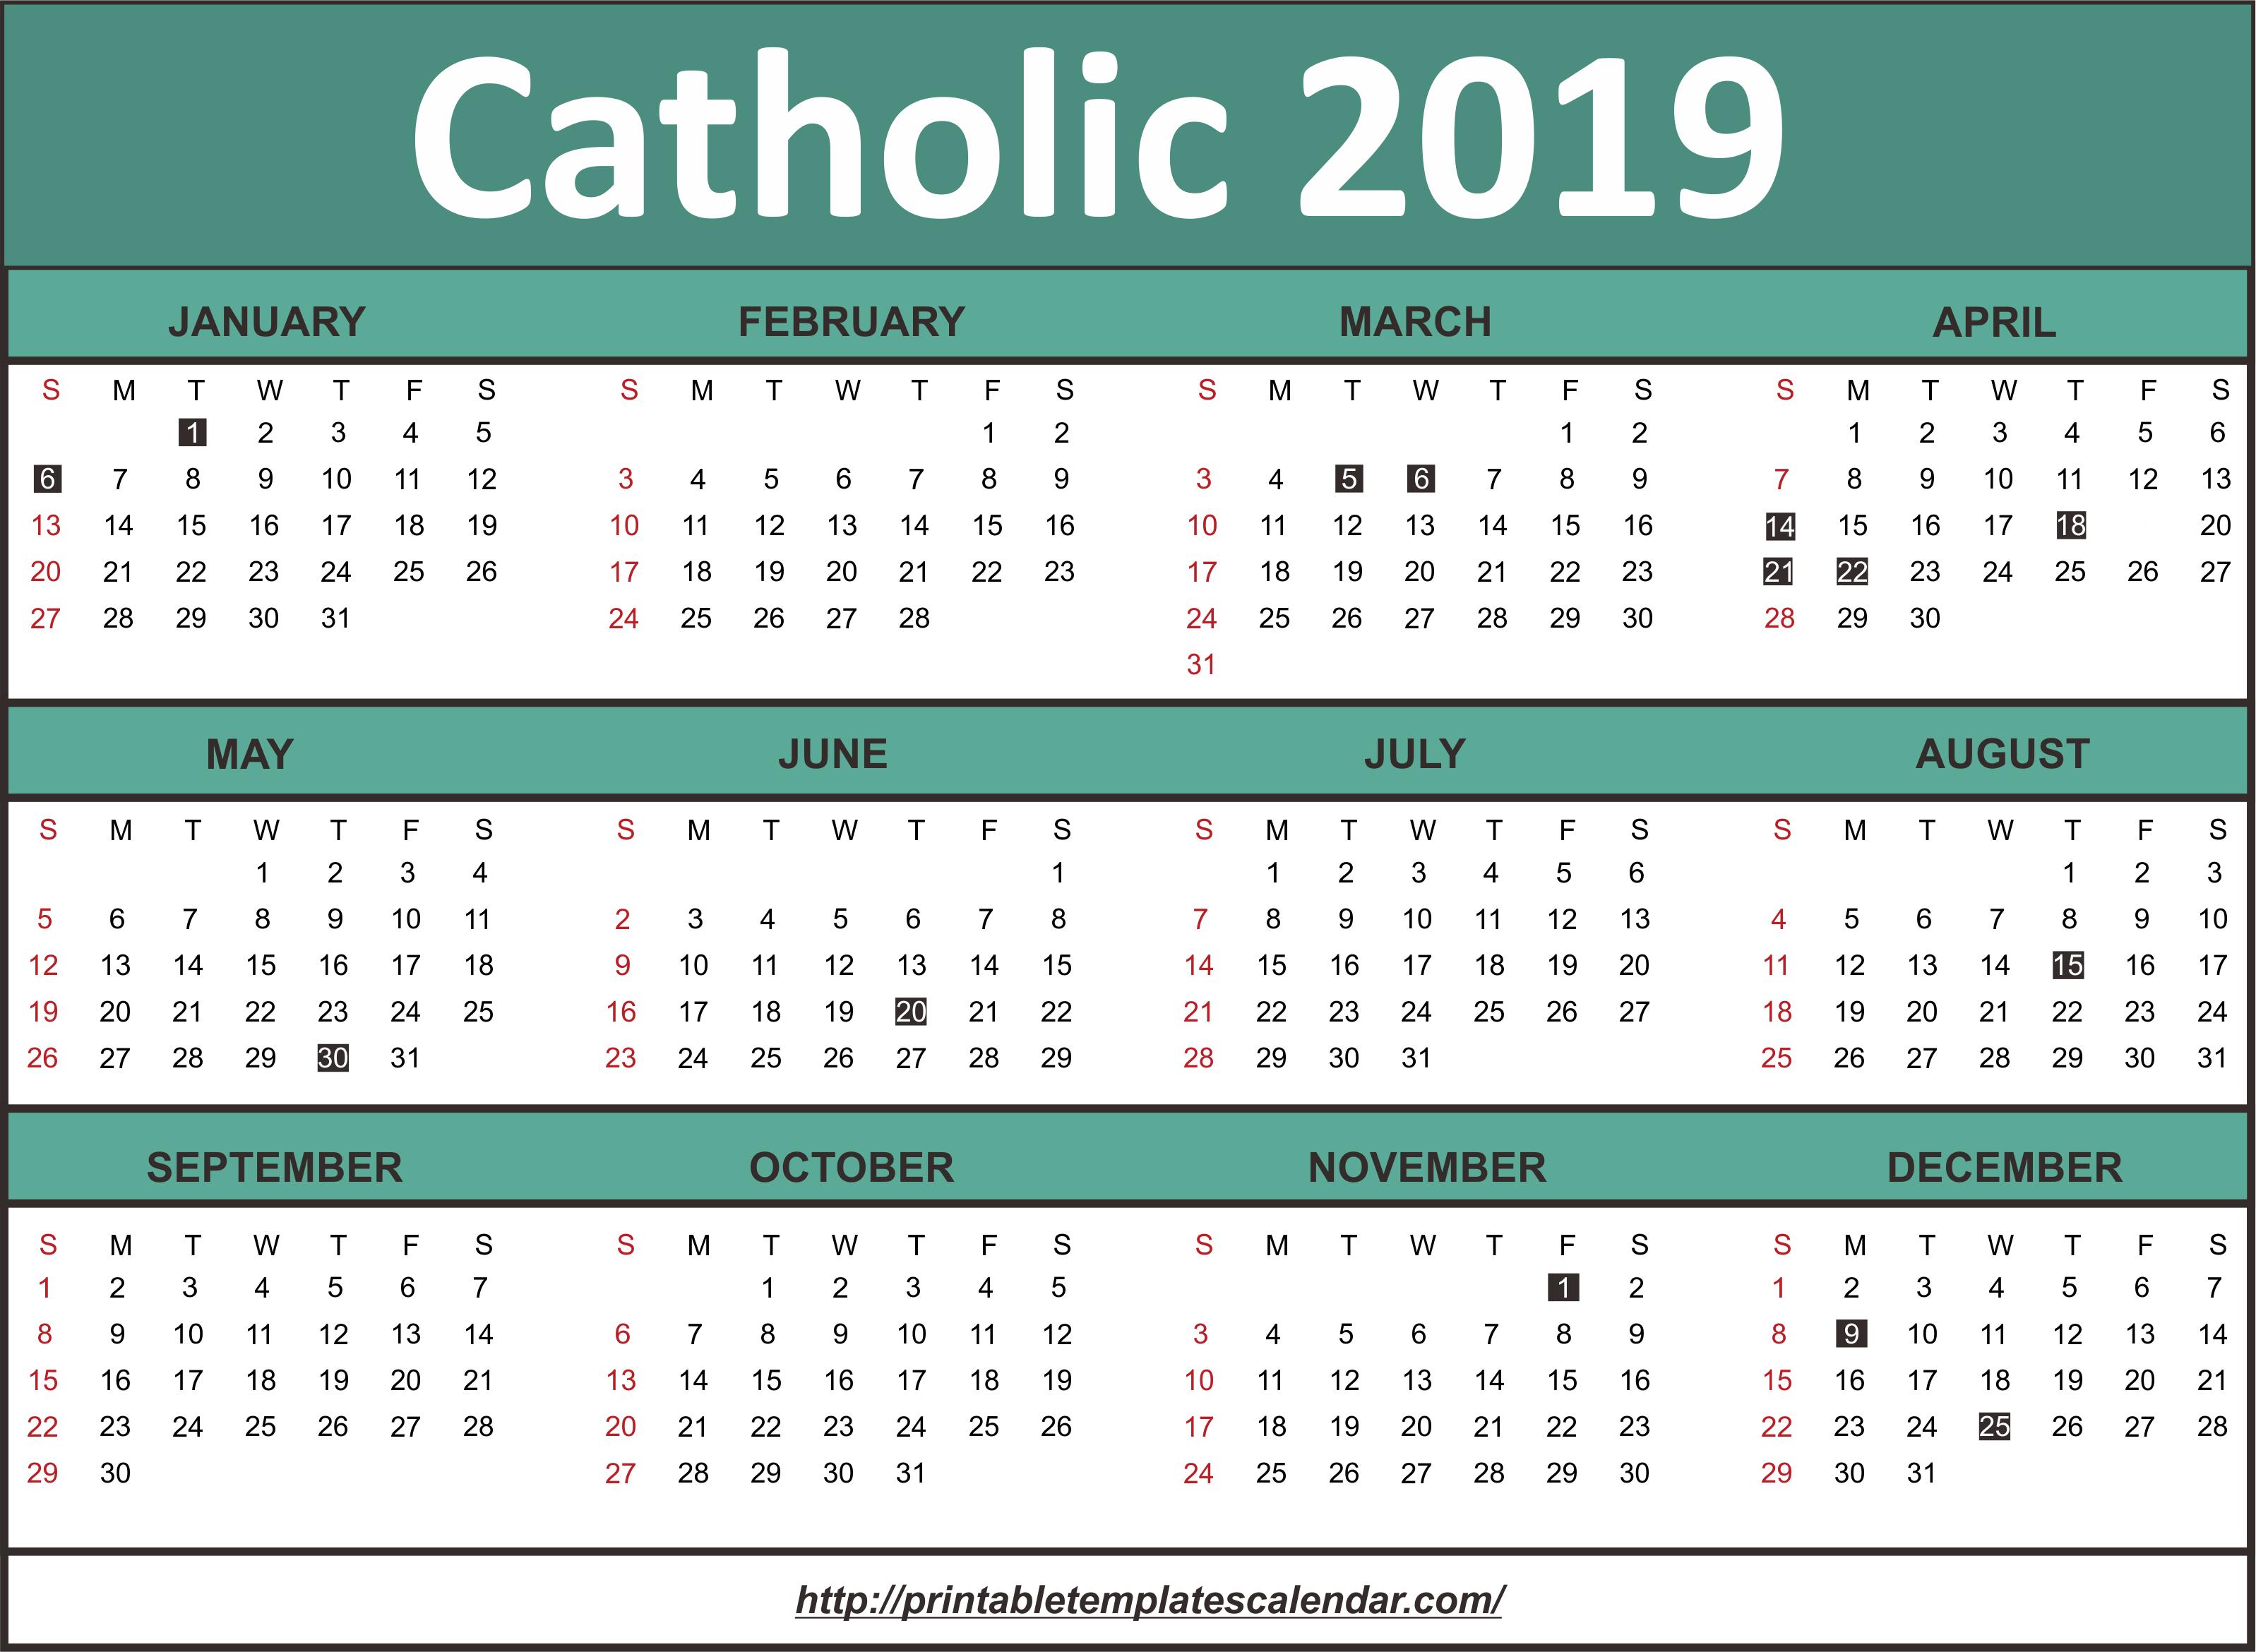 Roman Catholic Calendar 2019 | Calendar 2019 Calendar 2019 Catholic